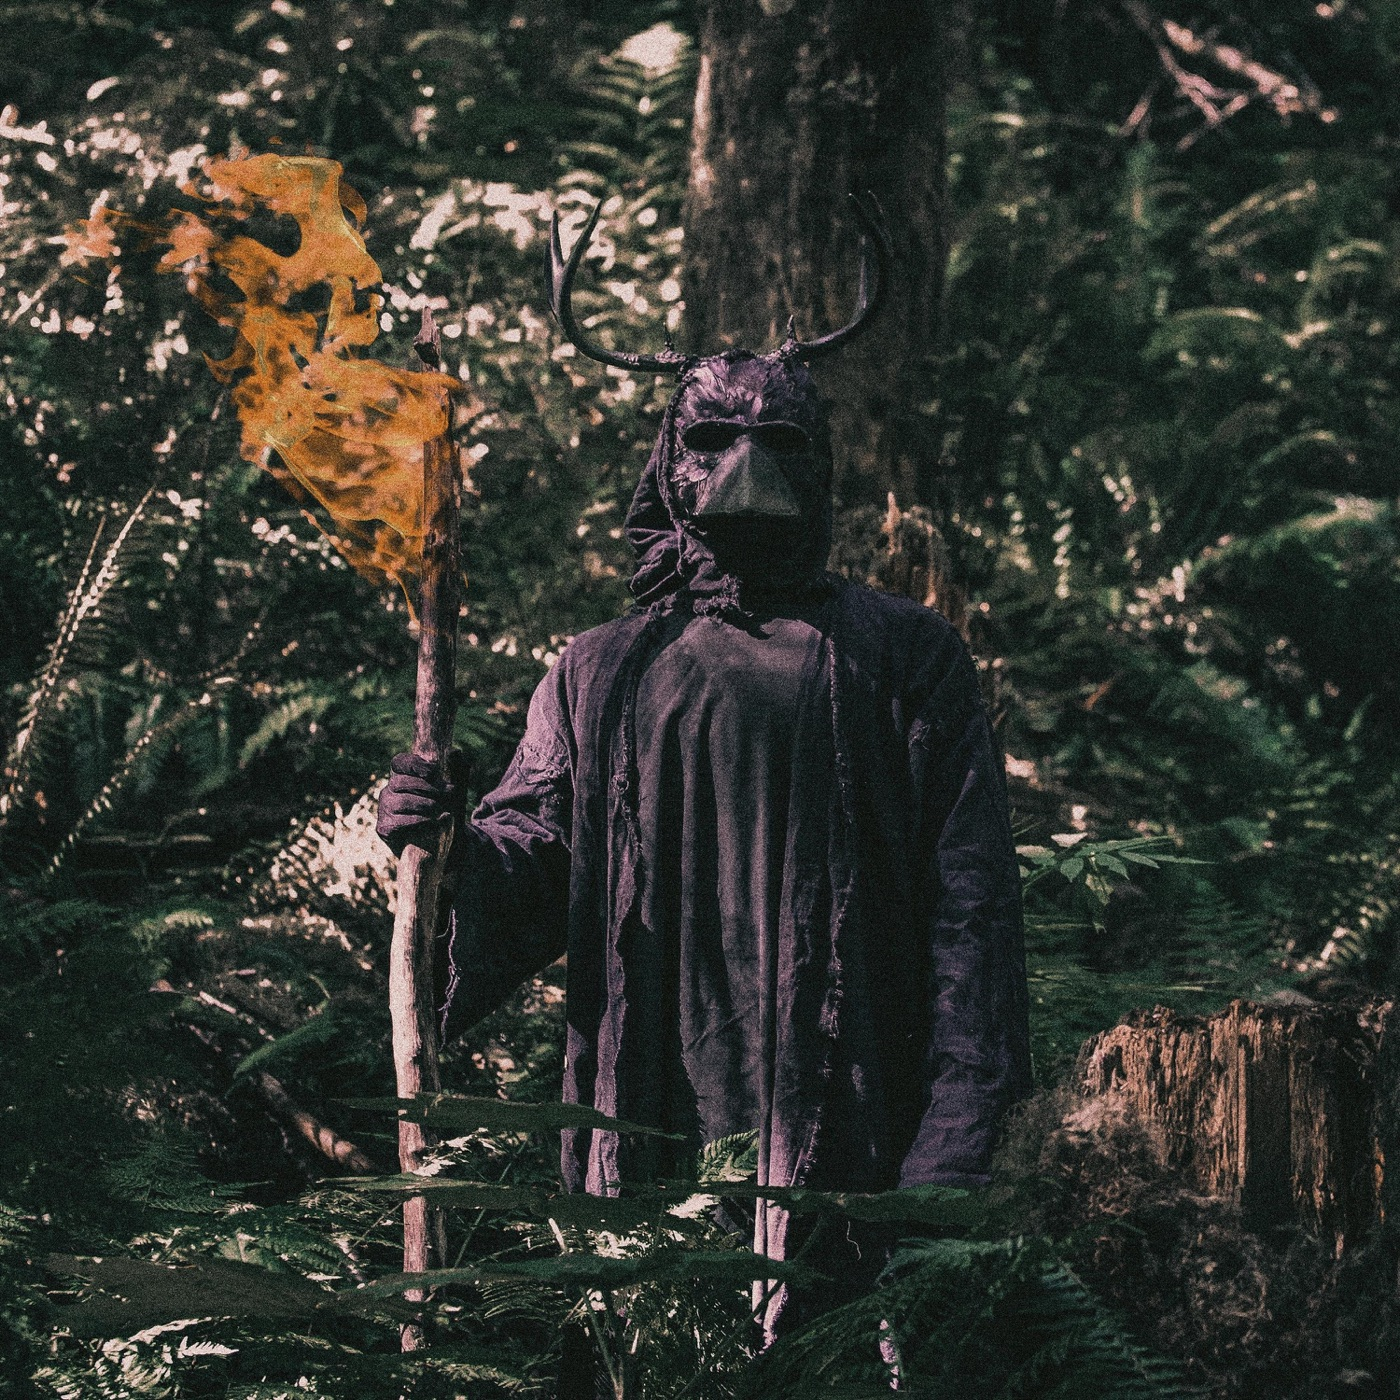 Arrival of Autumn - Harbinger (2019)